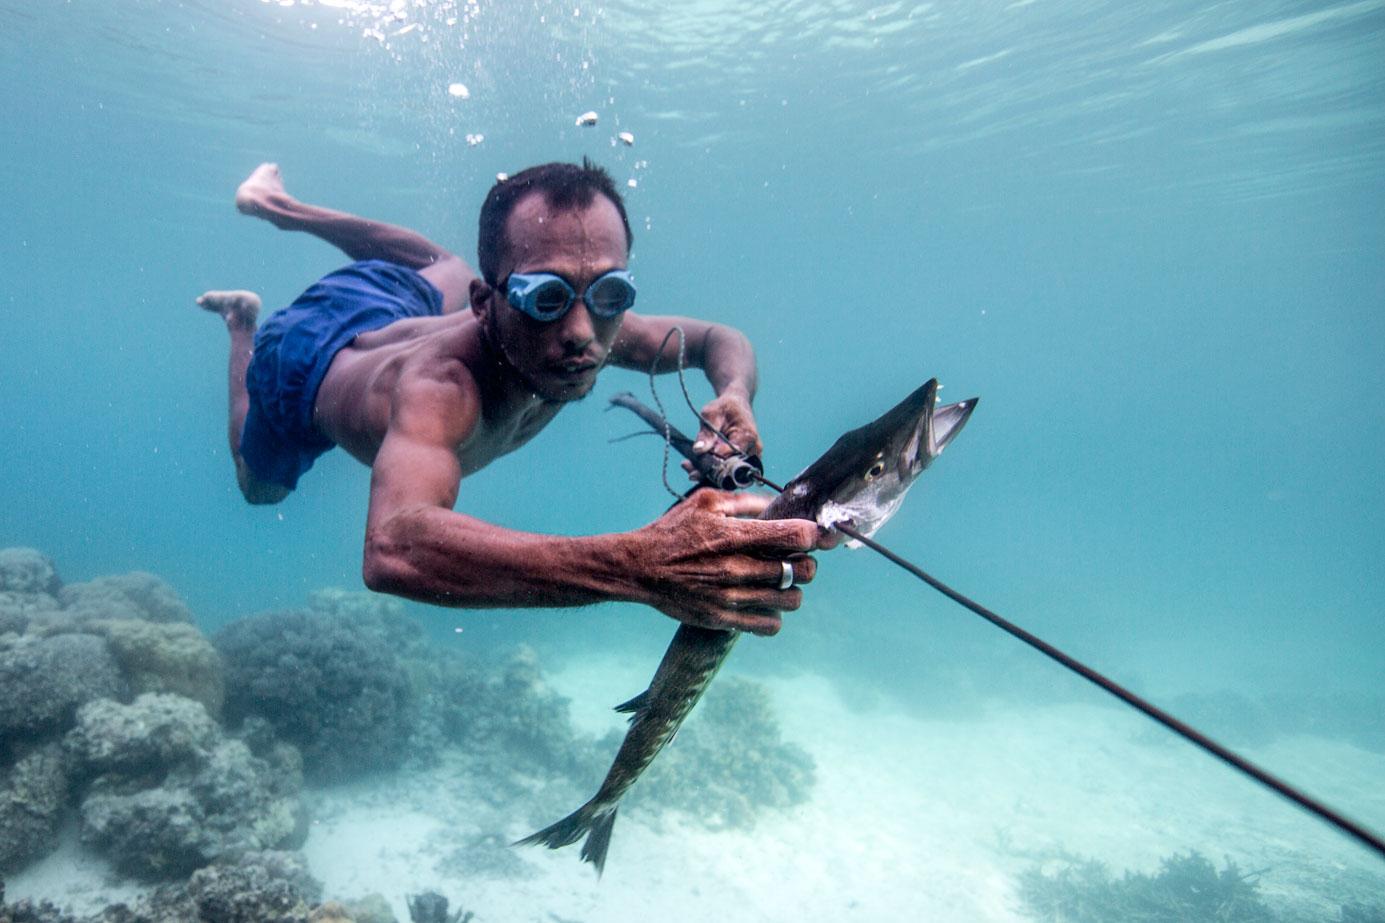 Man in sea harpooning a fish